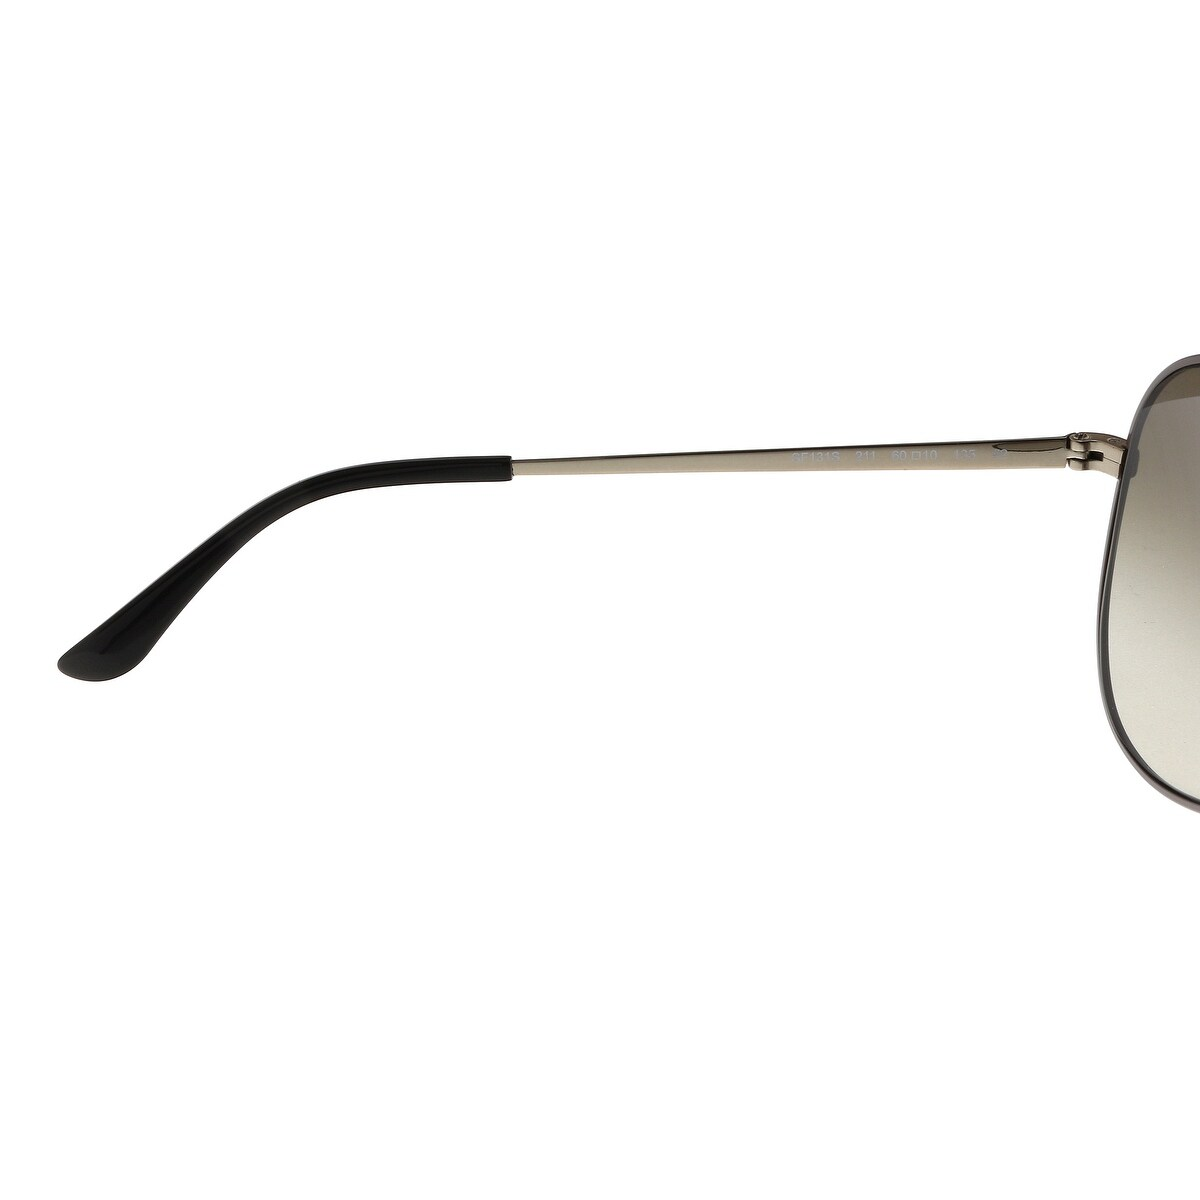 7888fc572337 Shop Salvatore Ferragamo SF131S 211 Shiny Brown W/ Dark Brown Aviator  Sunglasses - 60-10-135 - Free Shipping Today - Overstock - 26234253